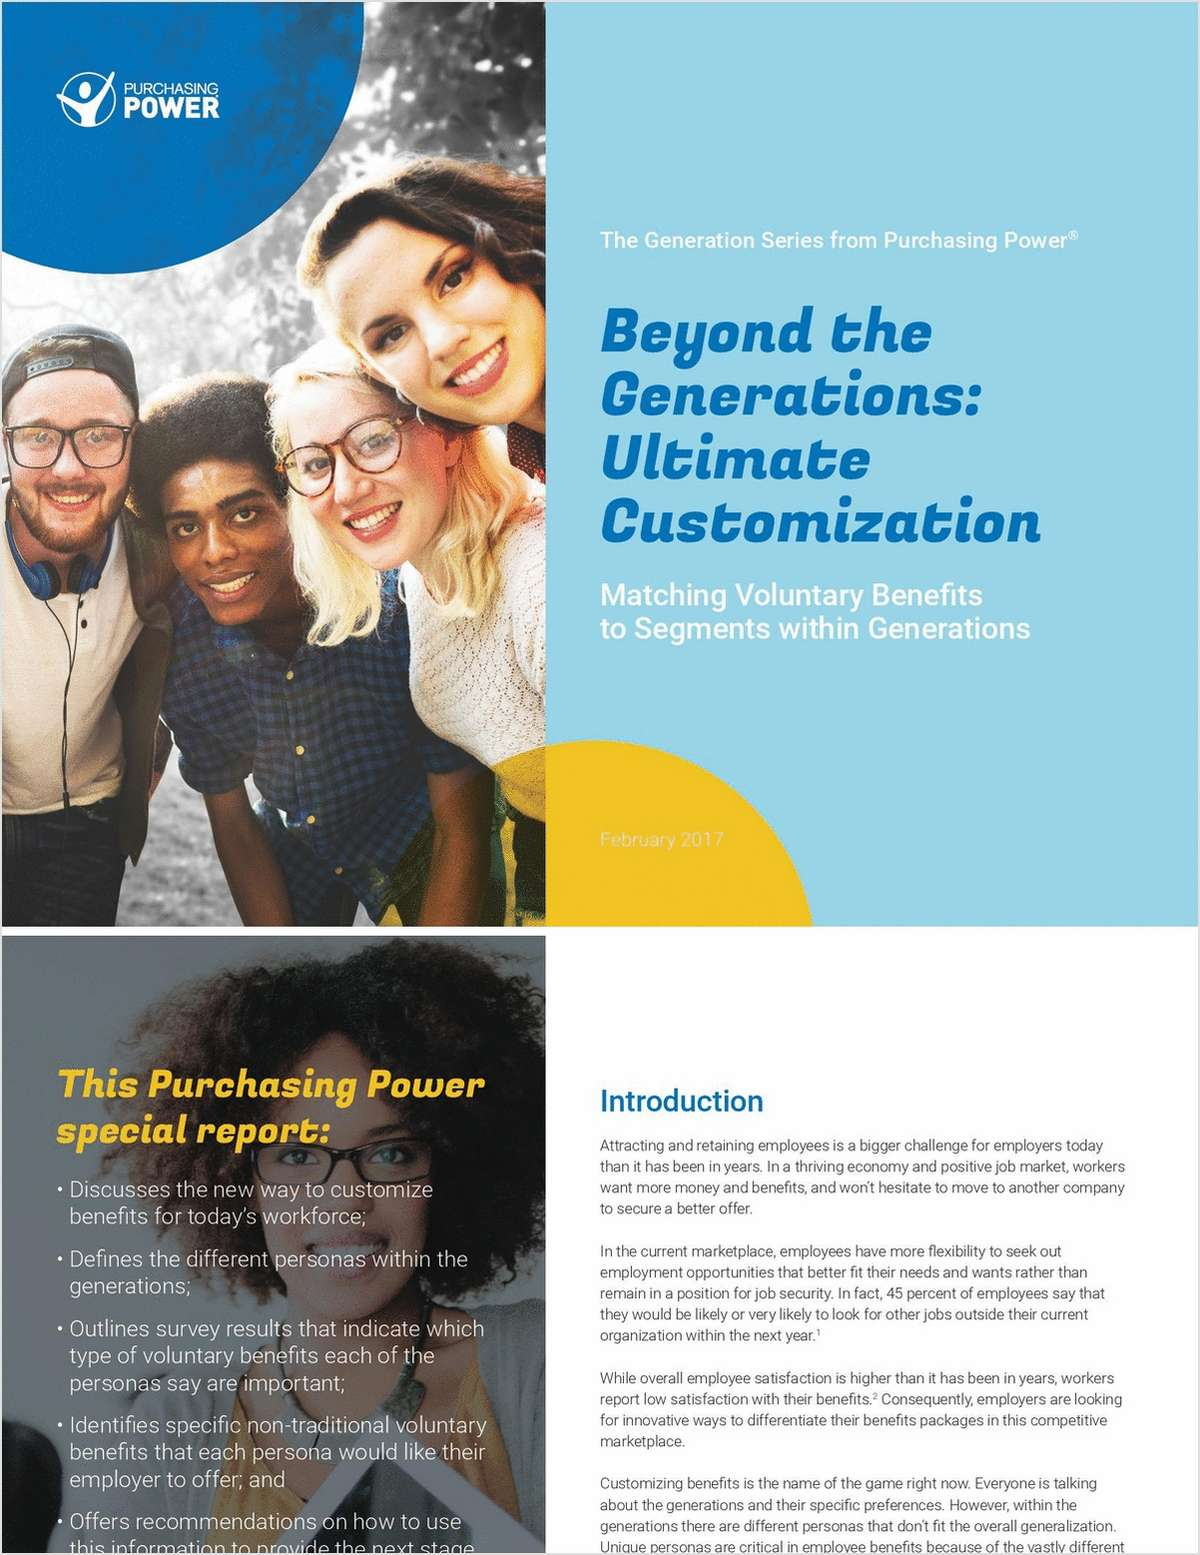 Beyond the Generations: Ultimate Customization